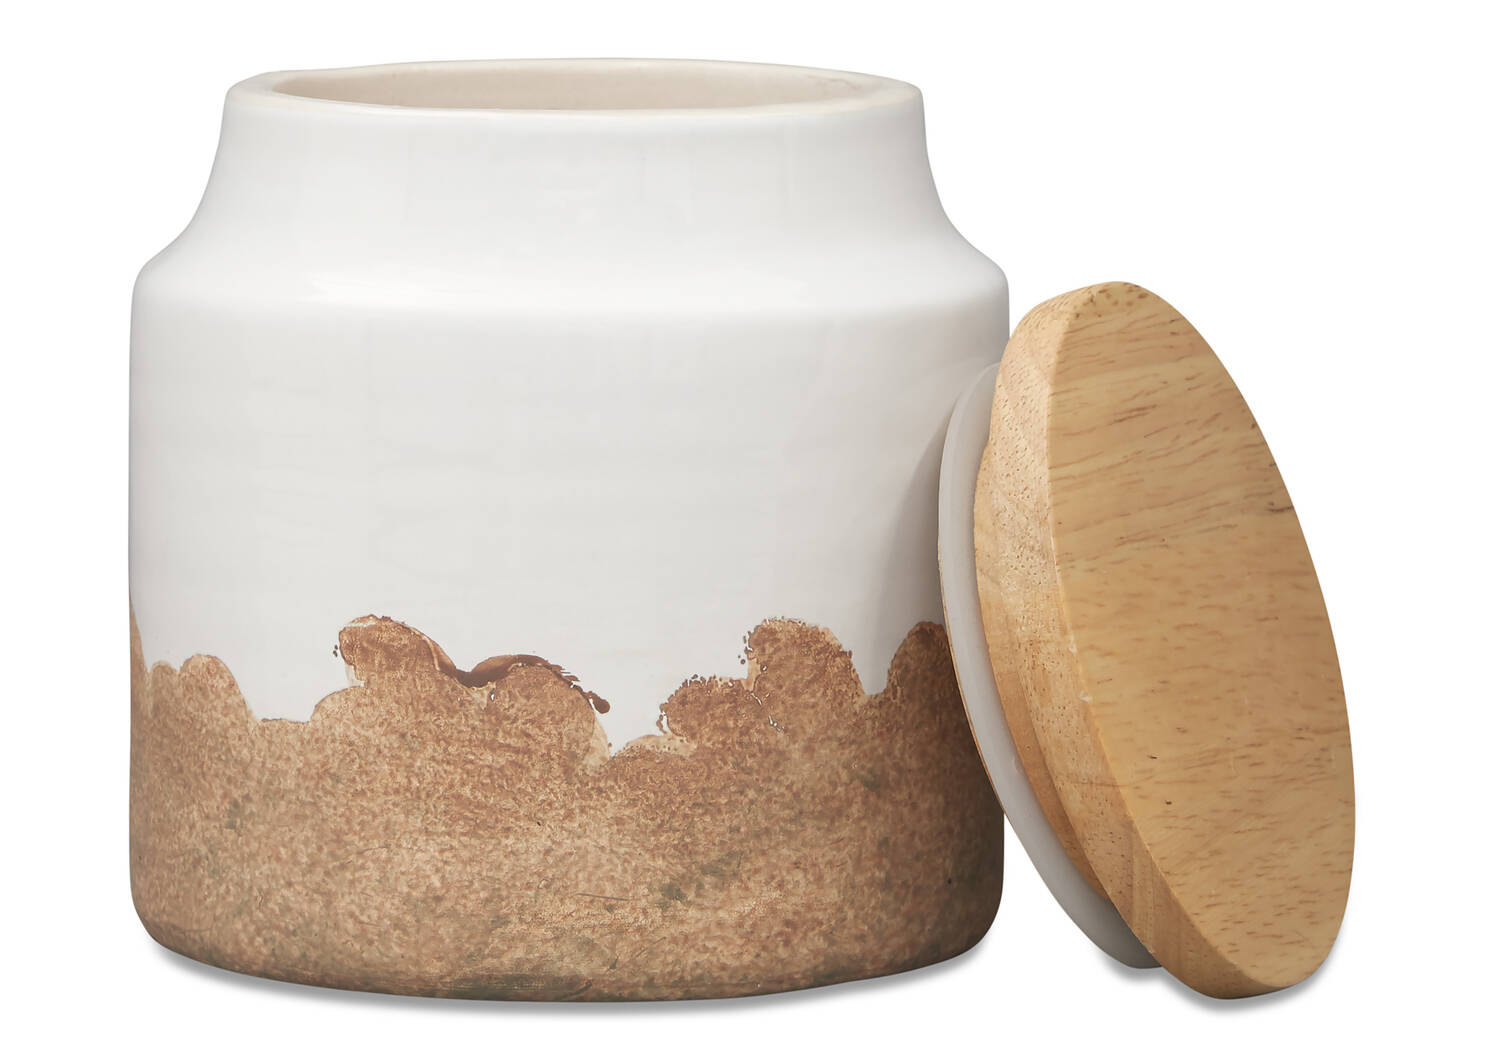 Petit bocal Vanna lait/naturel